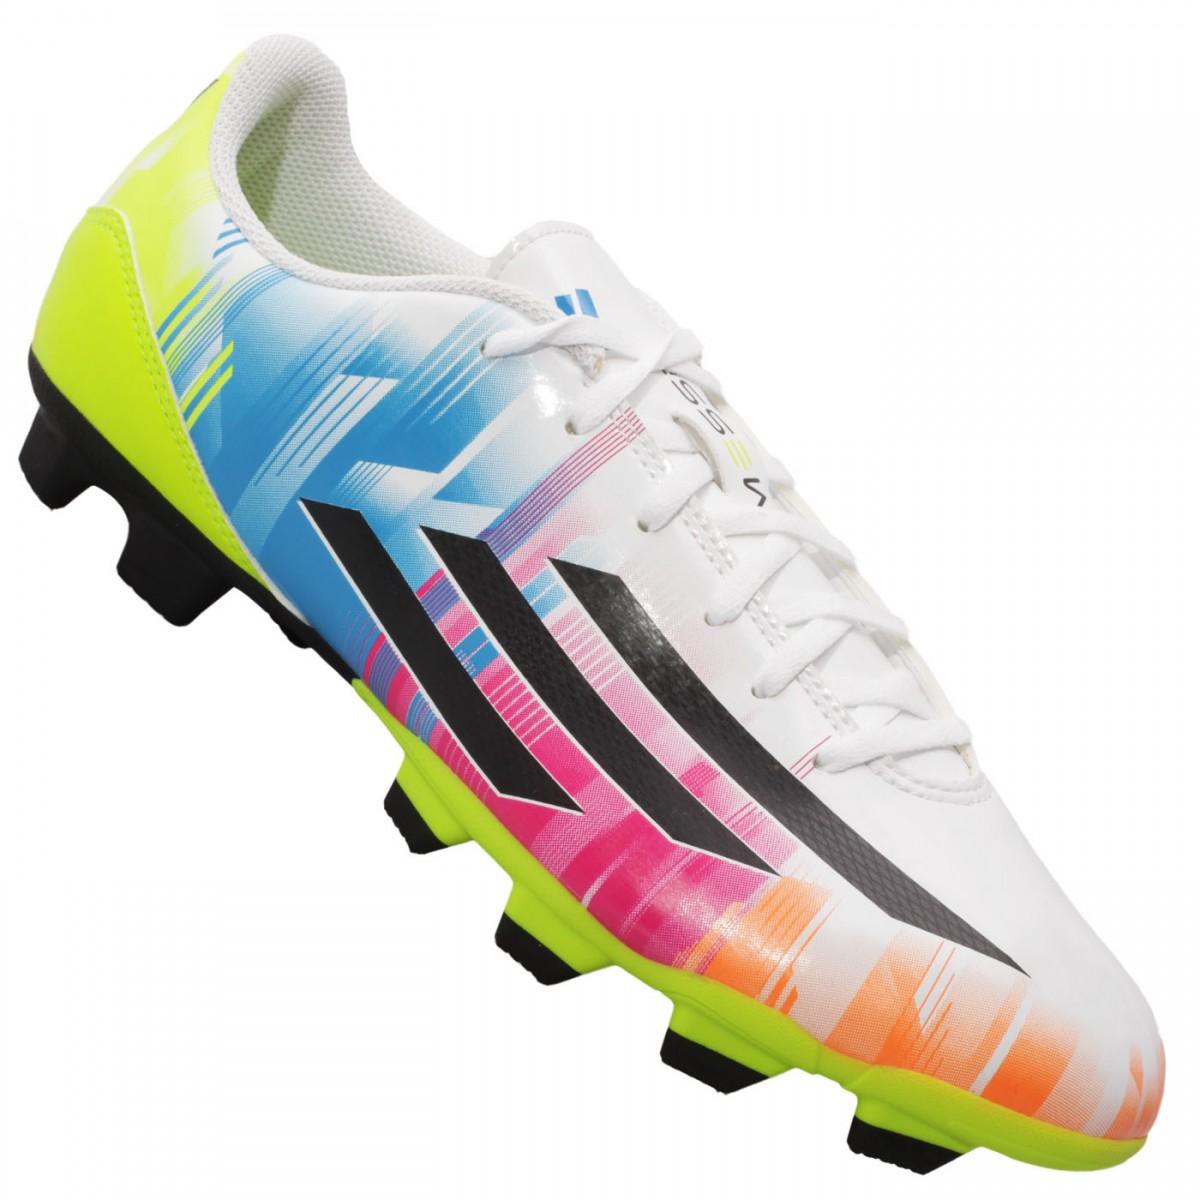 ecb2497c353 Chuteira Adidas F5 TRX FG Messi